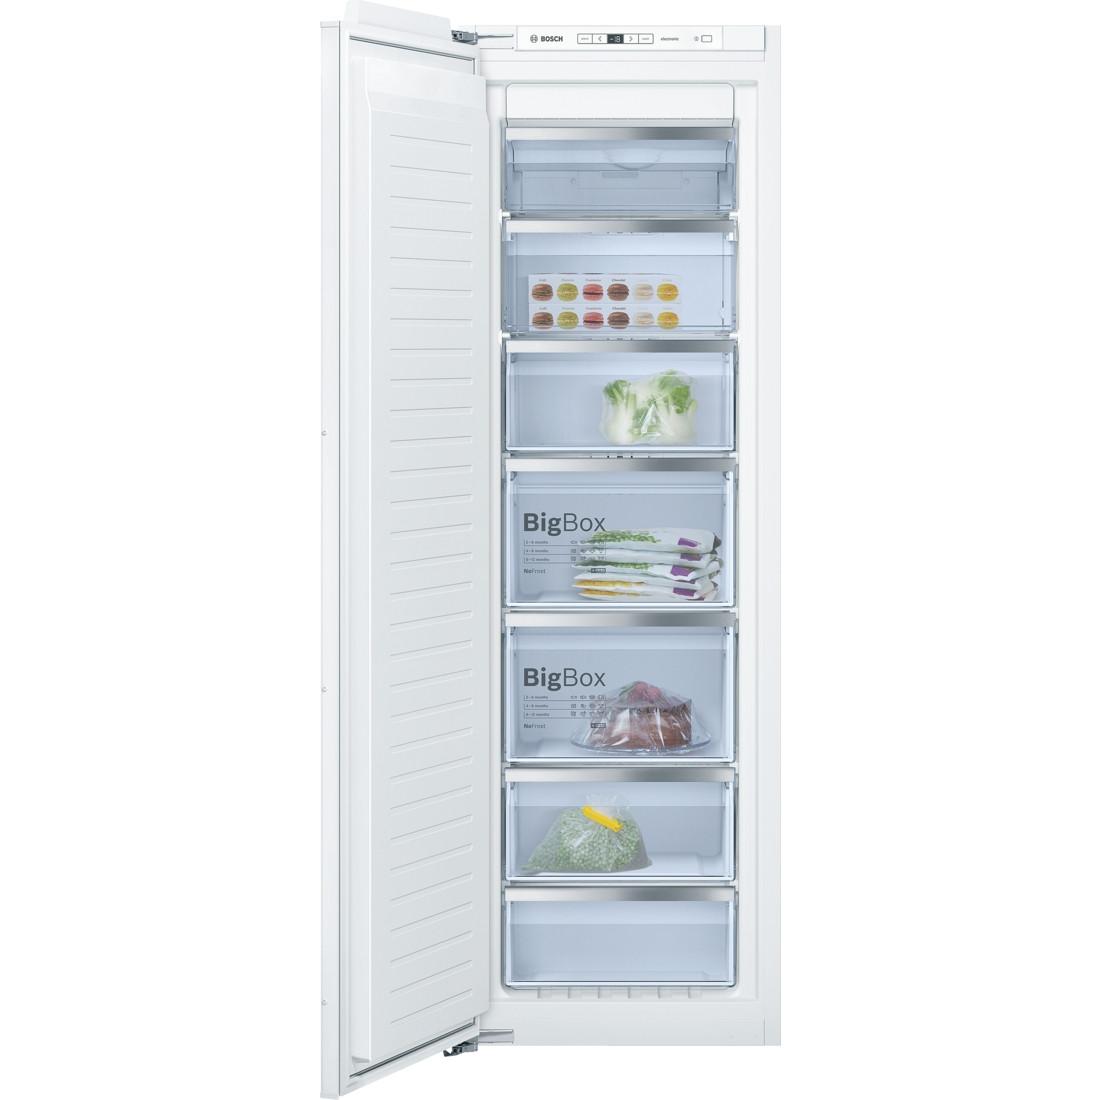 Bosch GIN81AE30G 177 Tall Built-in Freezer